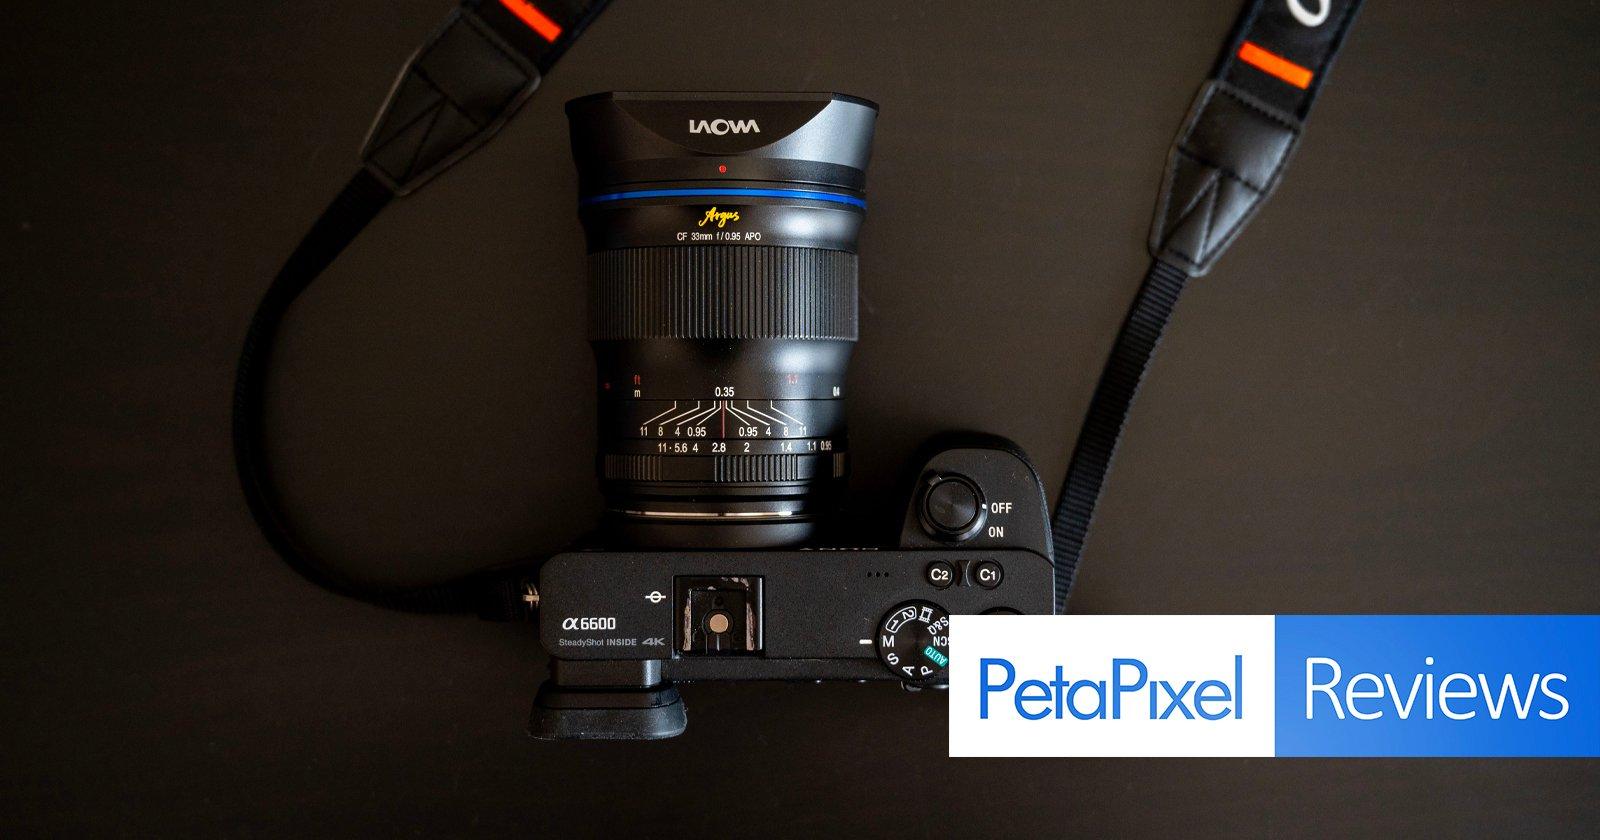 Laowa Argus 33mm f/0.95 CF APO Review: So. Much. Bokeh.